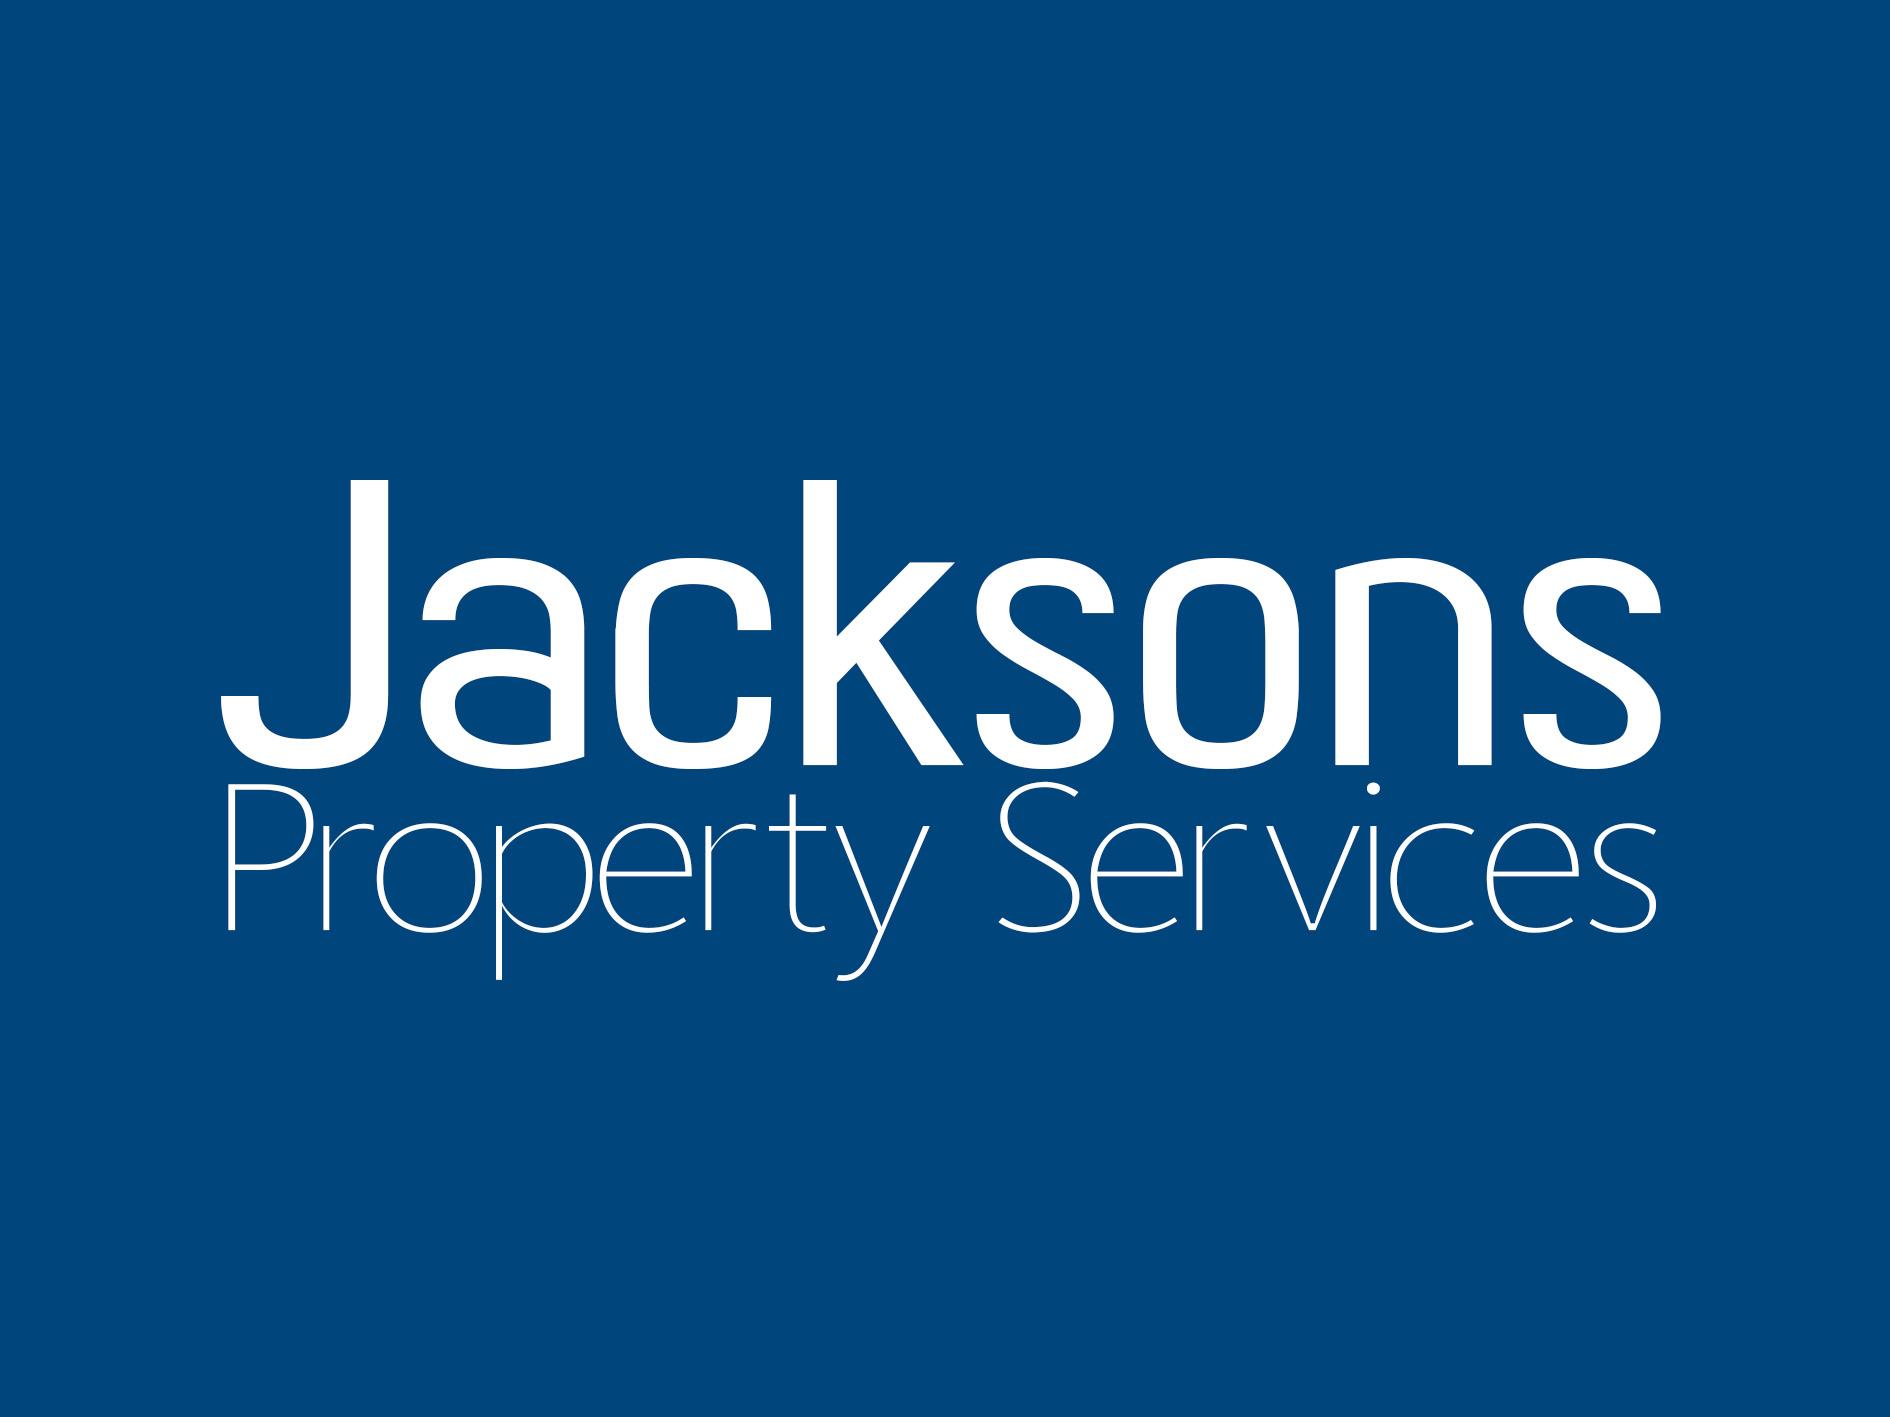 Jacksons Property Services